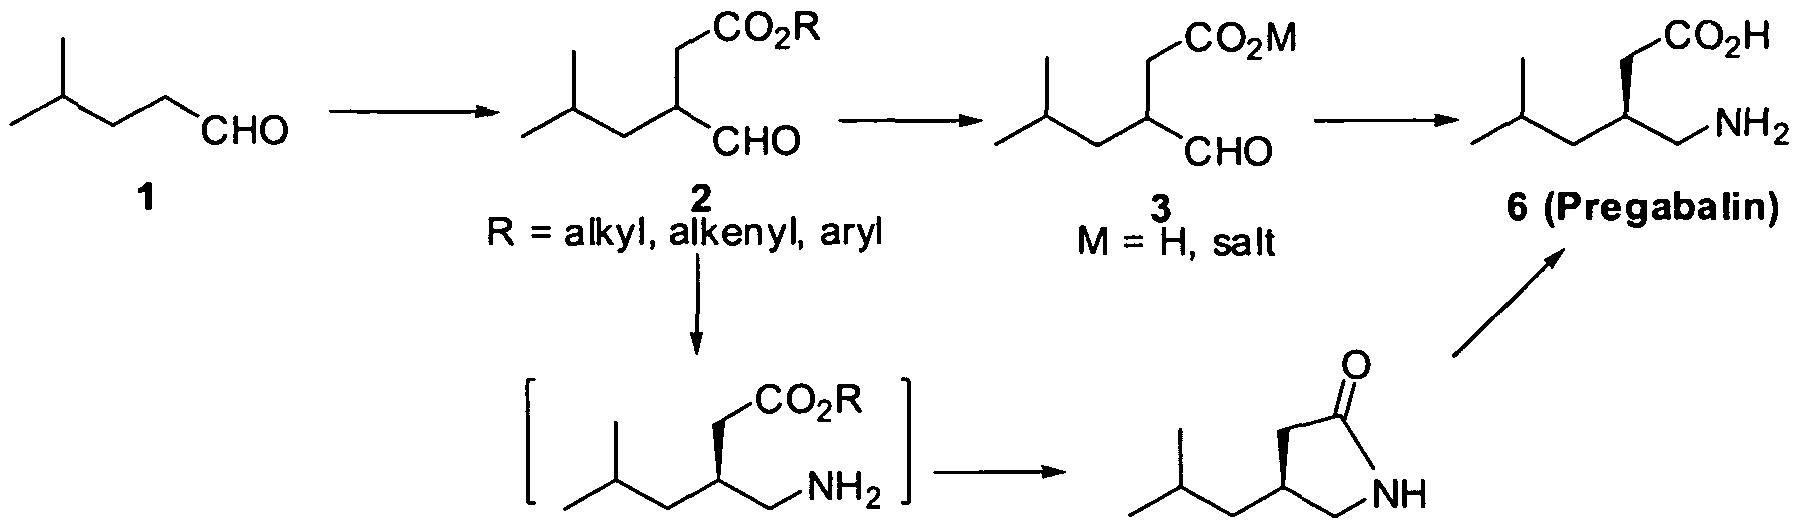 pregabalin s-enantiomer of cysteine